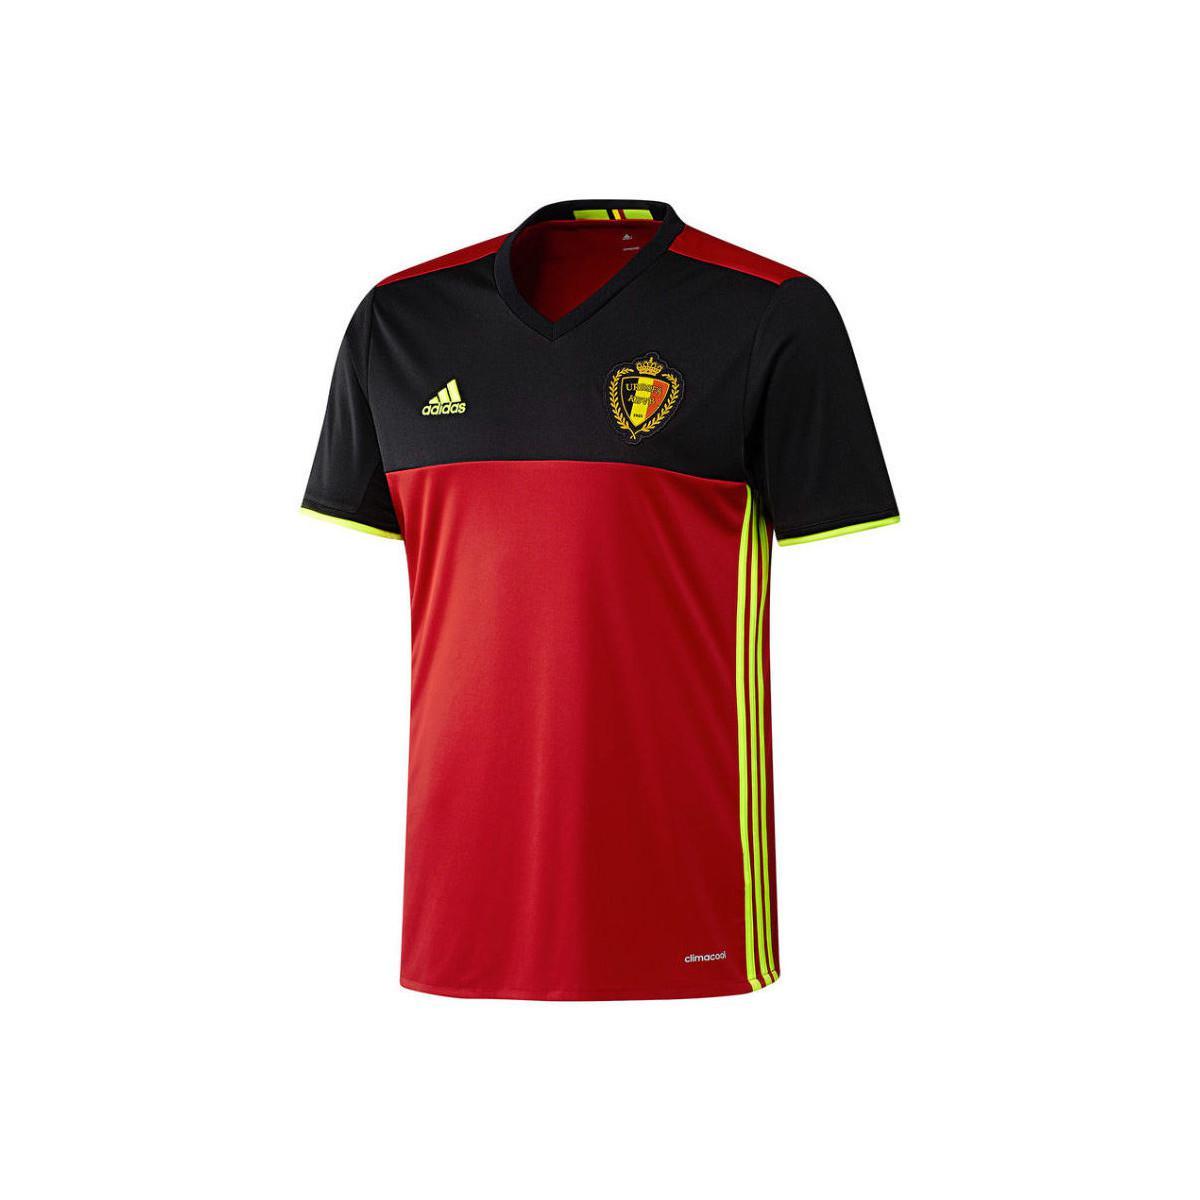 Adidas 2016-2017 Belgium Home Shirt (fellaini 8) Men s T Shirt In ... f741907b1